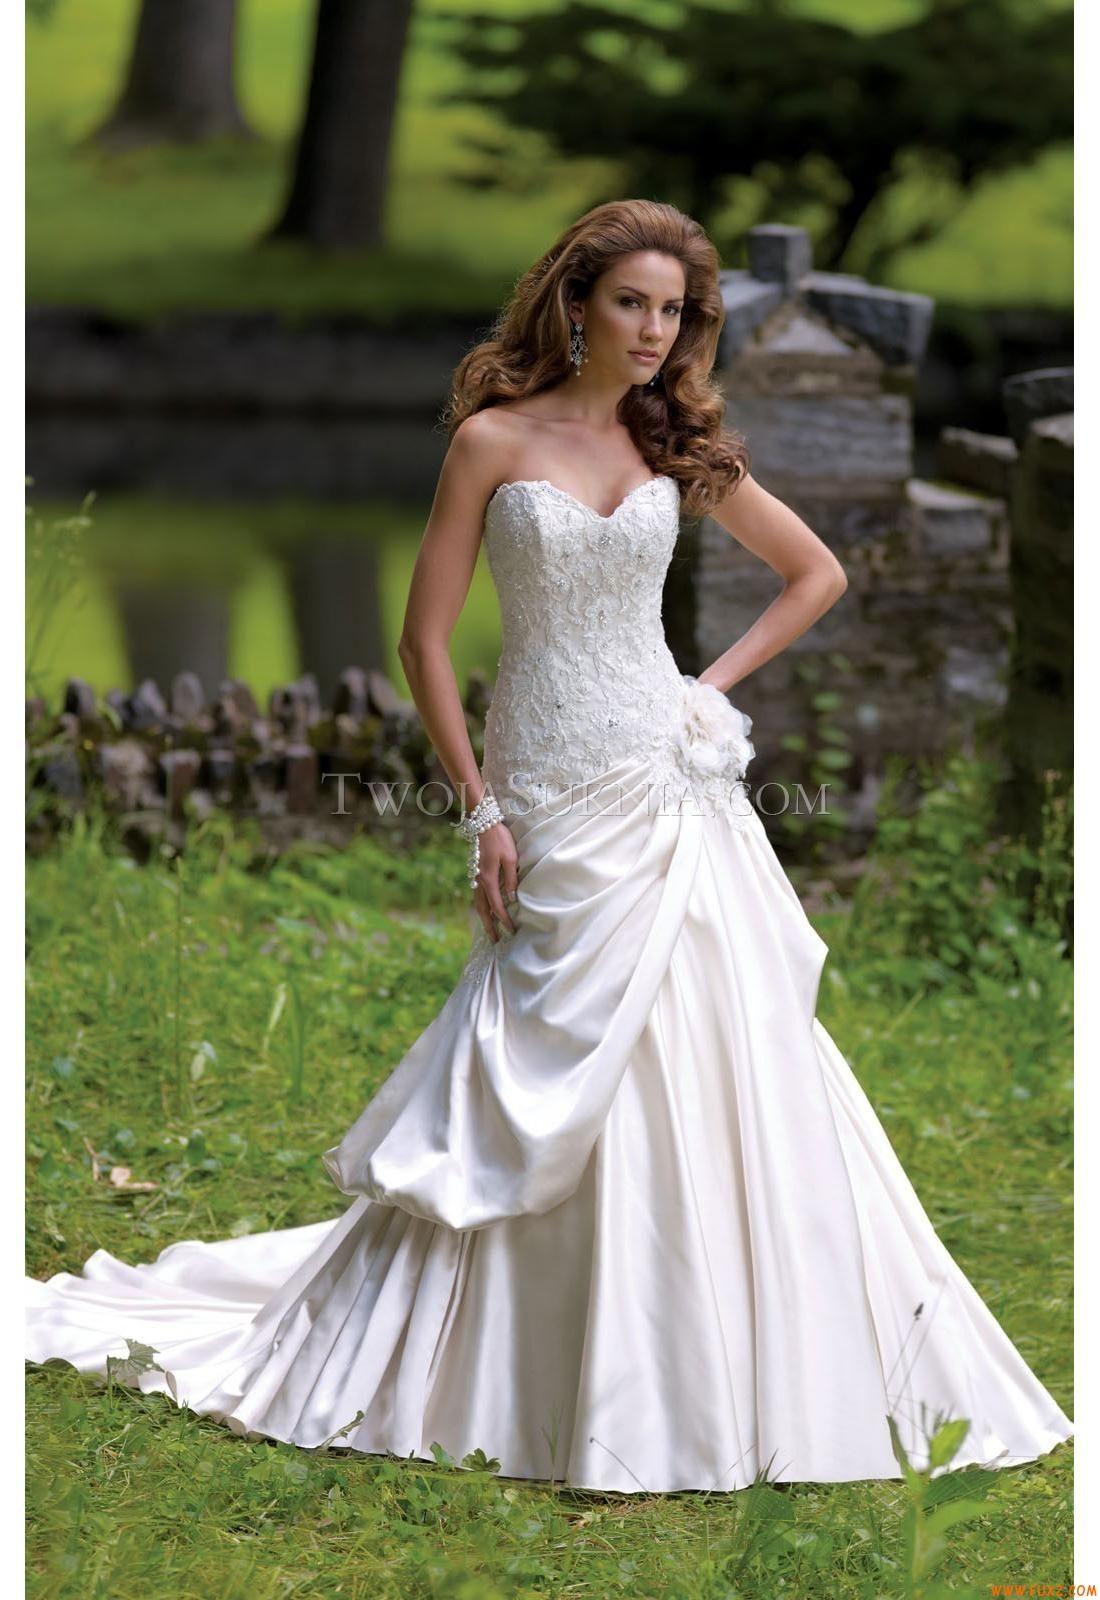 Elegant Sweetheart Mermaid Court Train Wedding Dresses China Mon Cheri 113225 - Pandora David Tutera